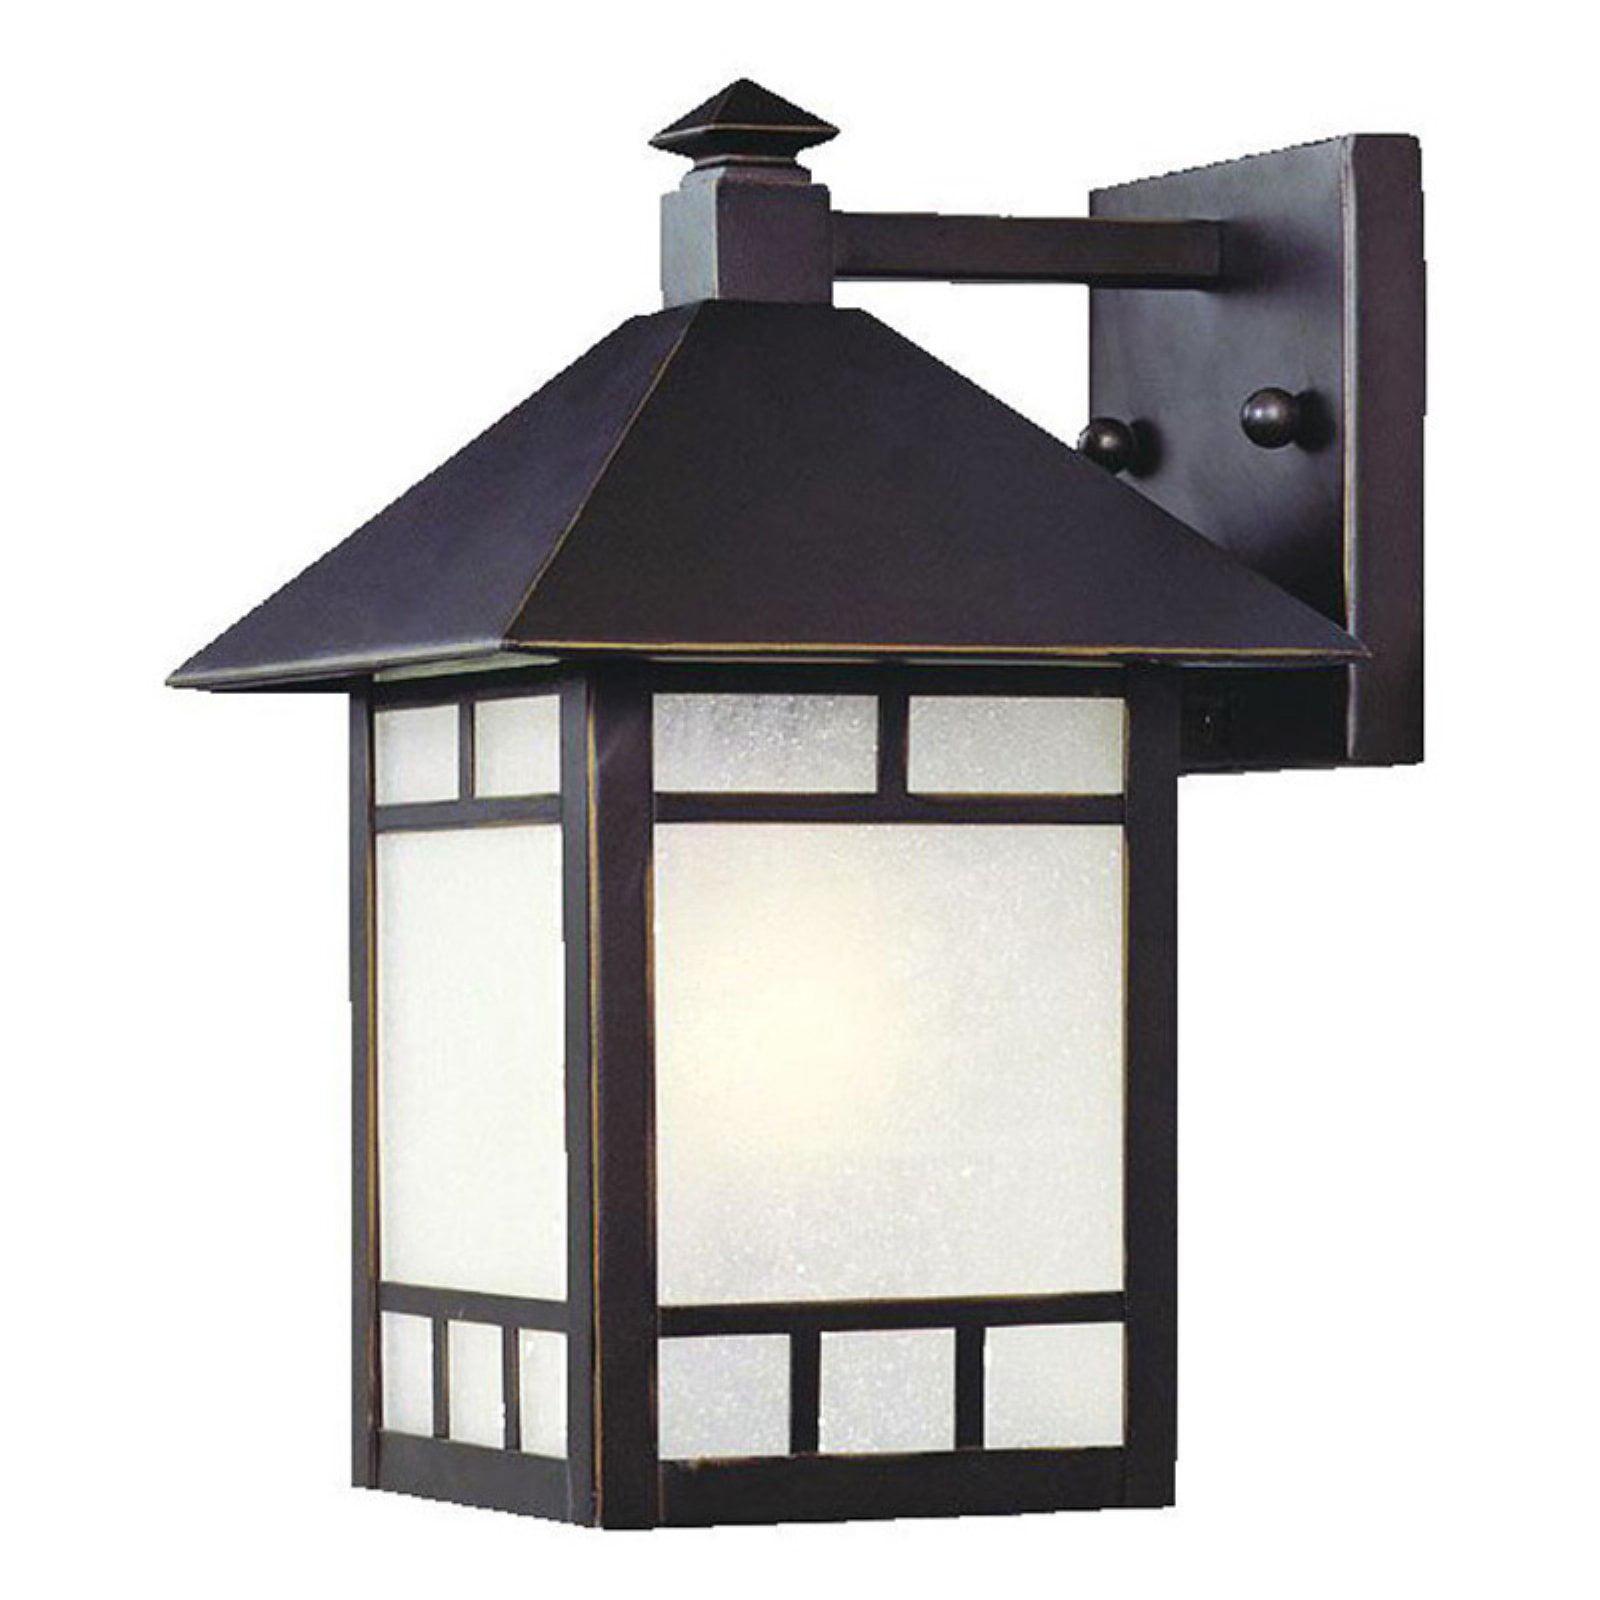 Acclaim Lighting Artisan 7 in. Outdoor Wall Mount Light Fixture